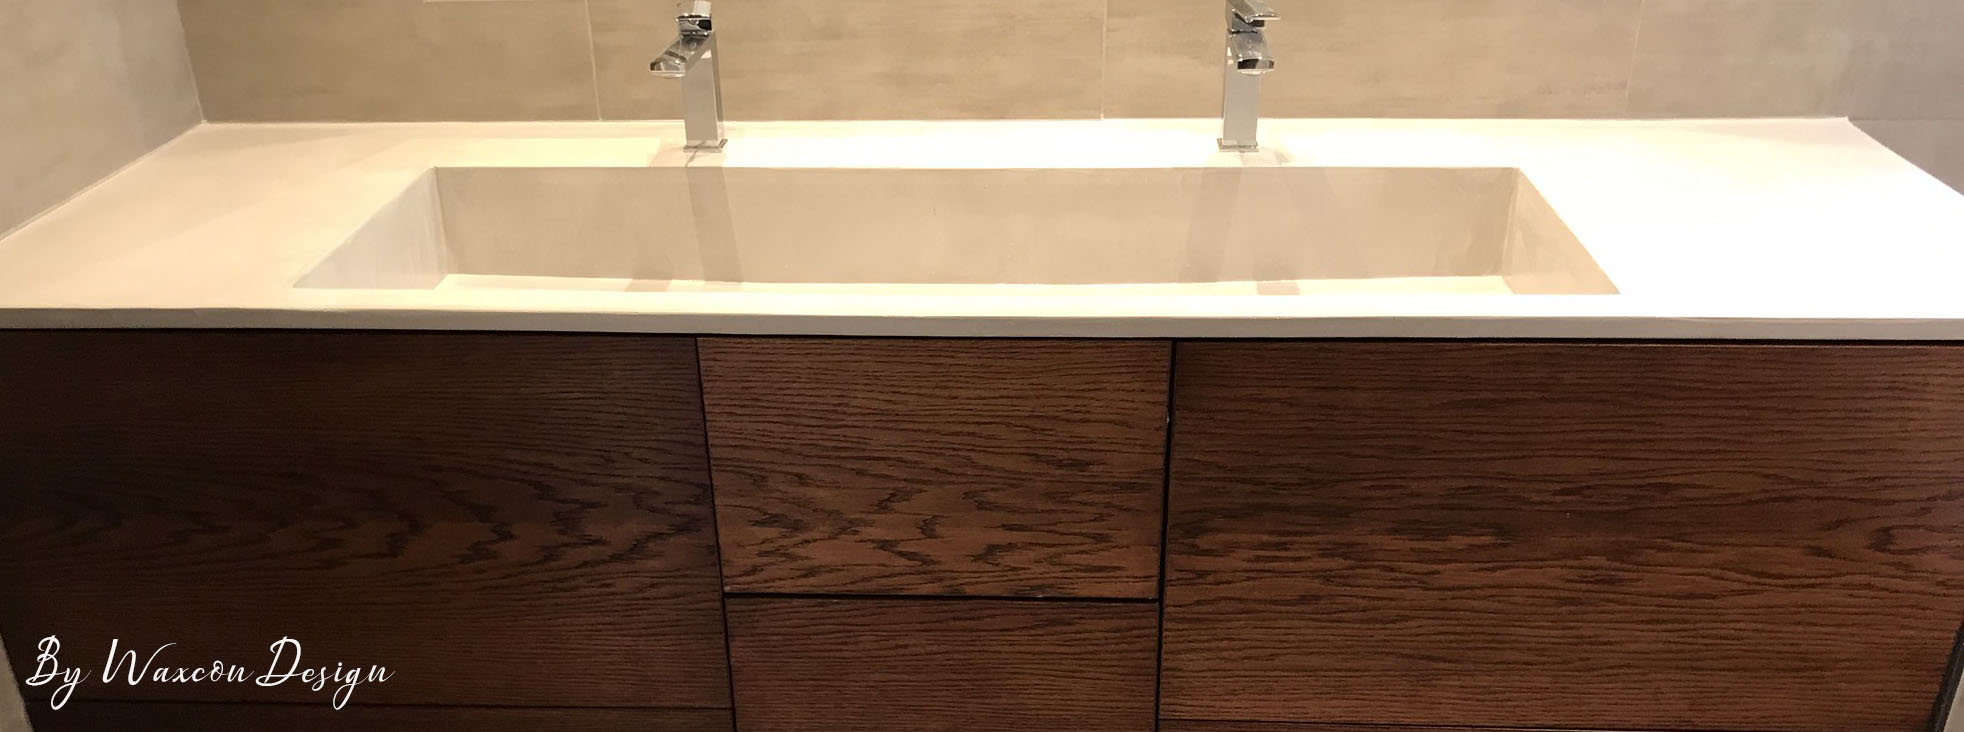 vasque en beton cire blanc